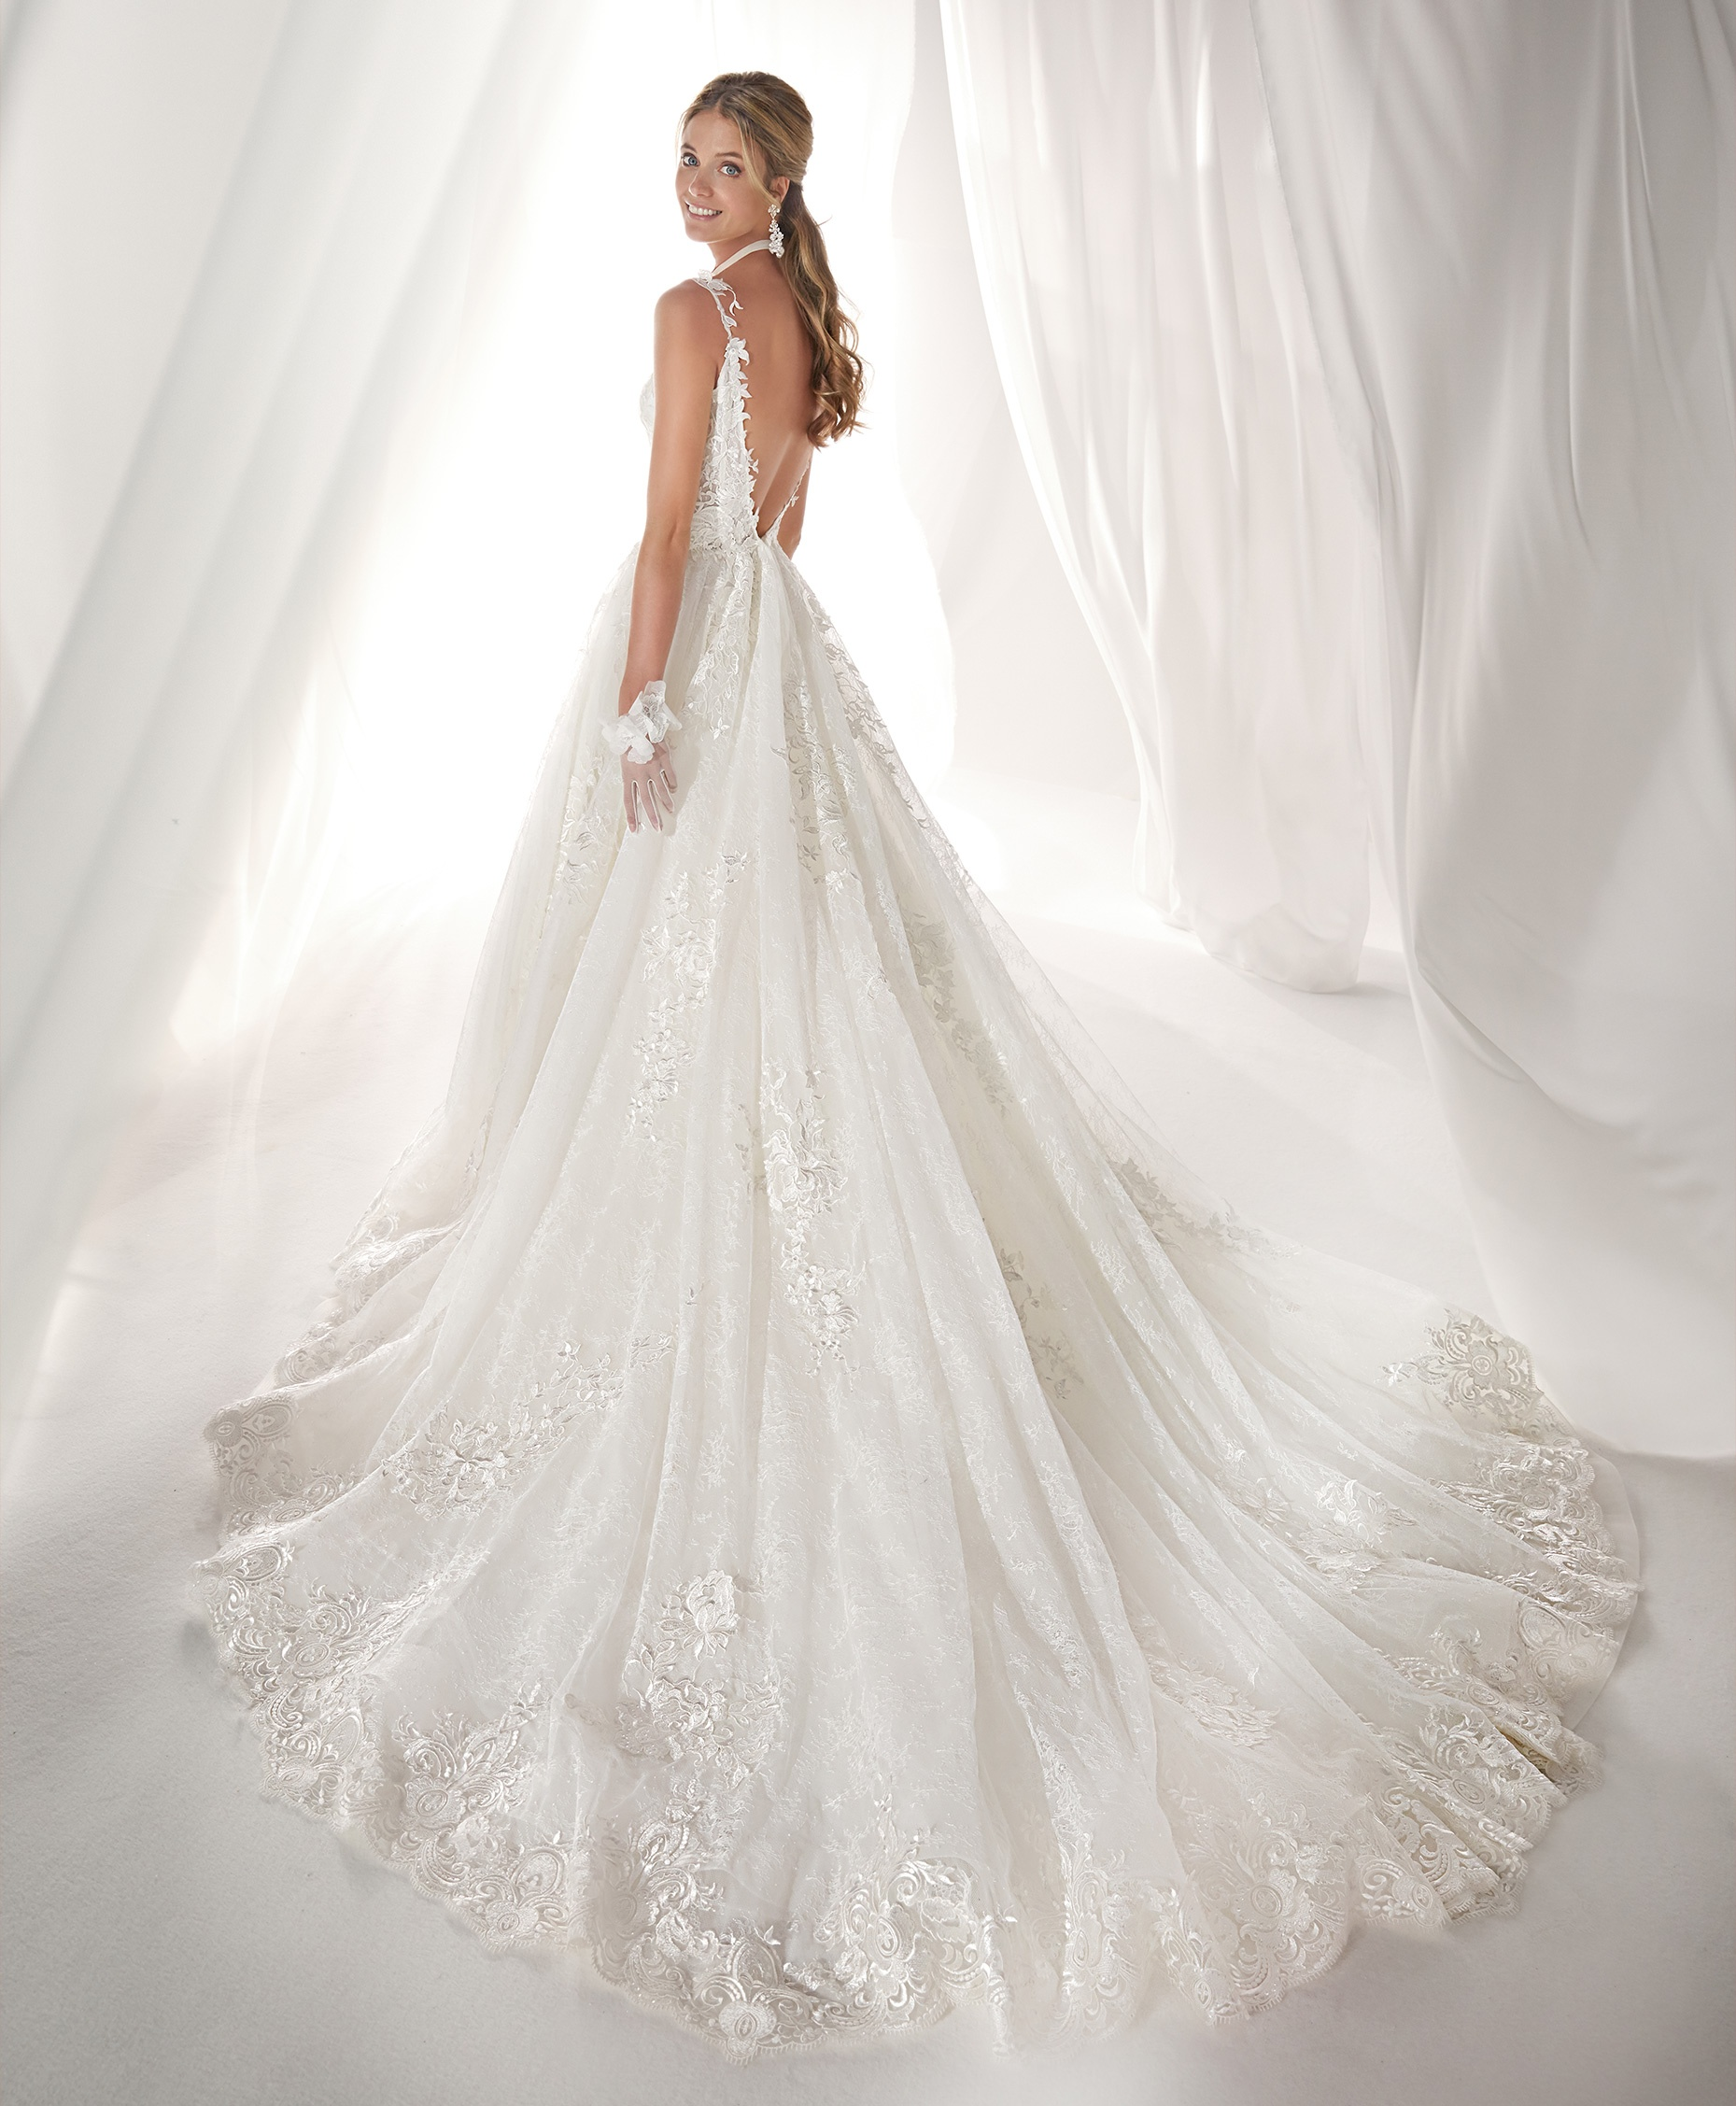 NIAB19147 esküvői ruha - NICOLE SPOSE Milano kollekció